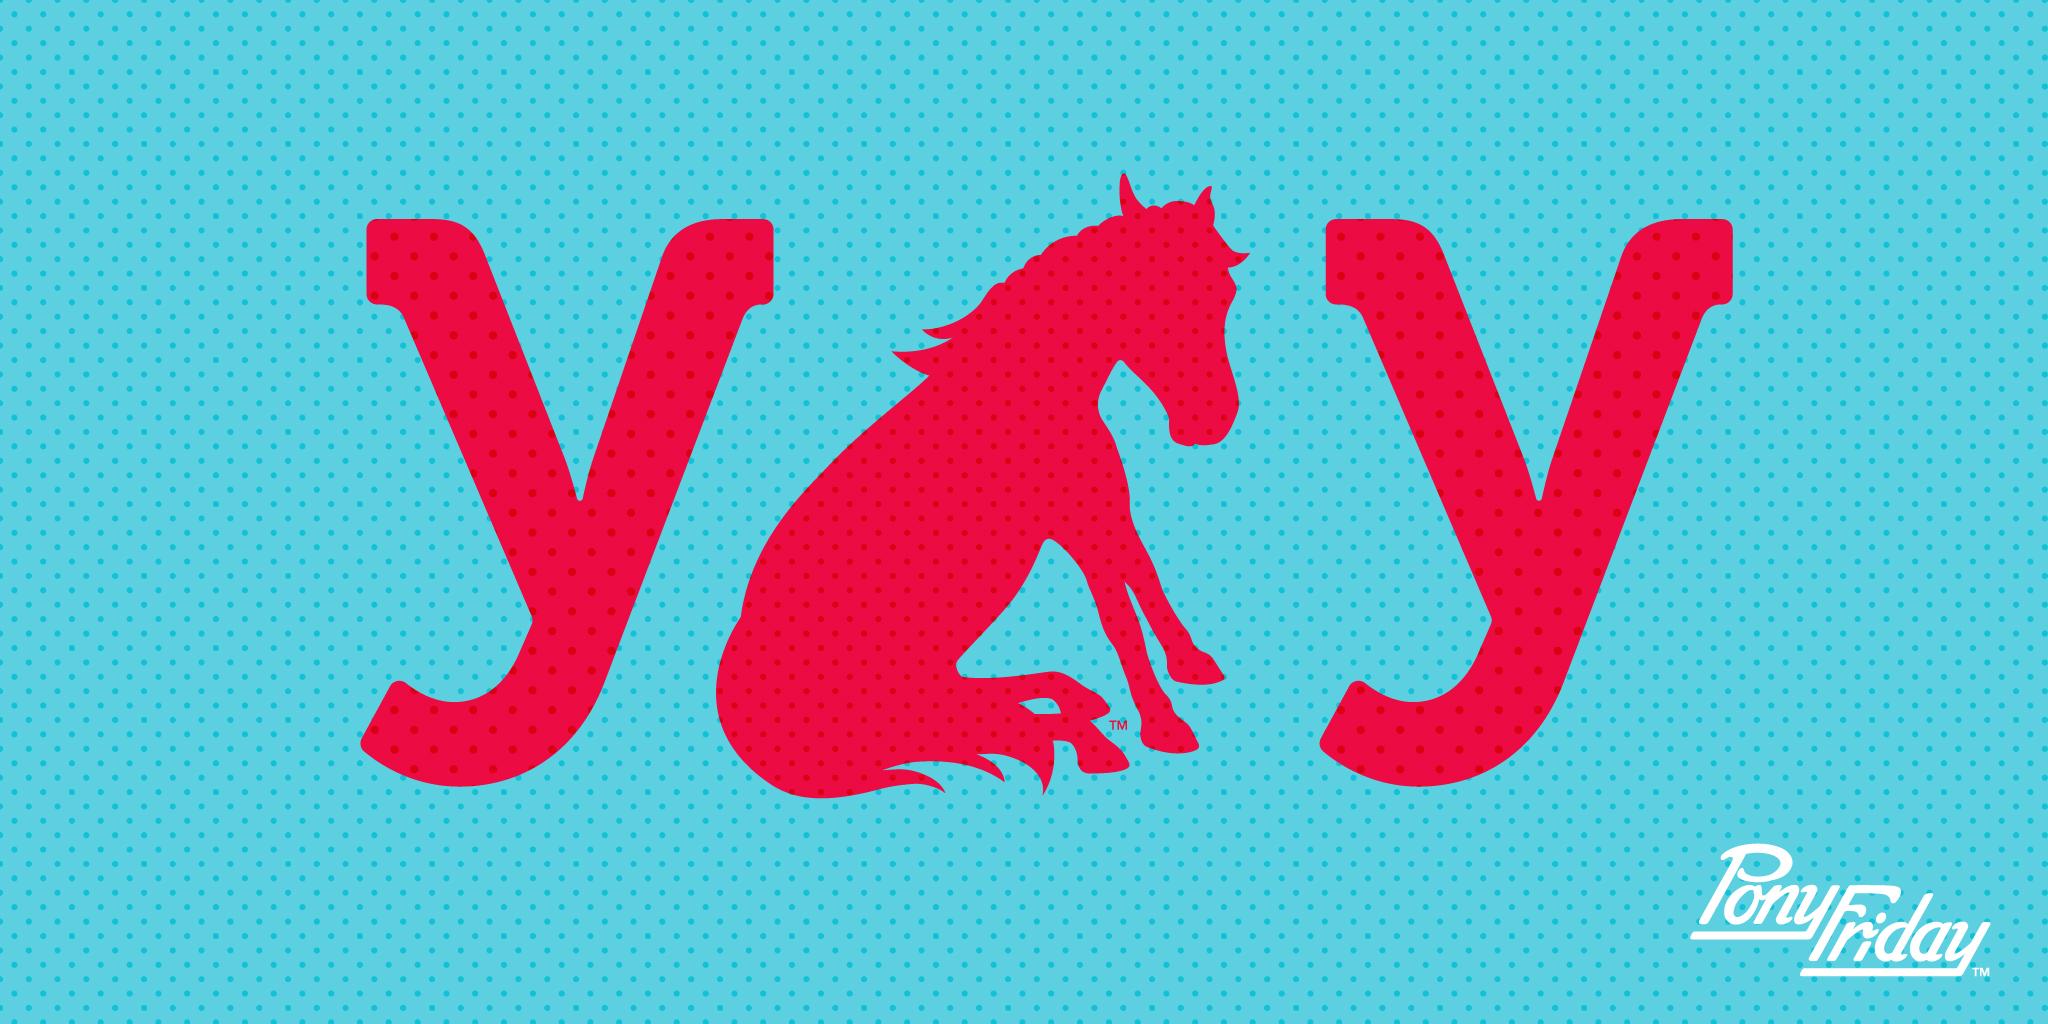 Pony-Friday-Yay-Type-Red-Blue-Blog-Header-Graphic.jpg